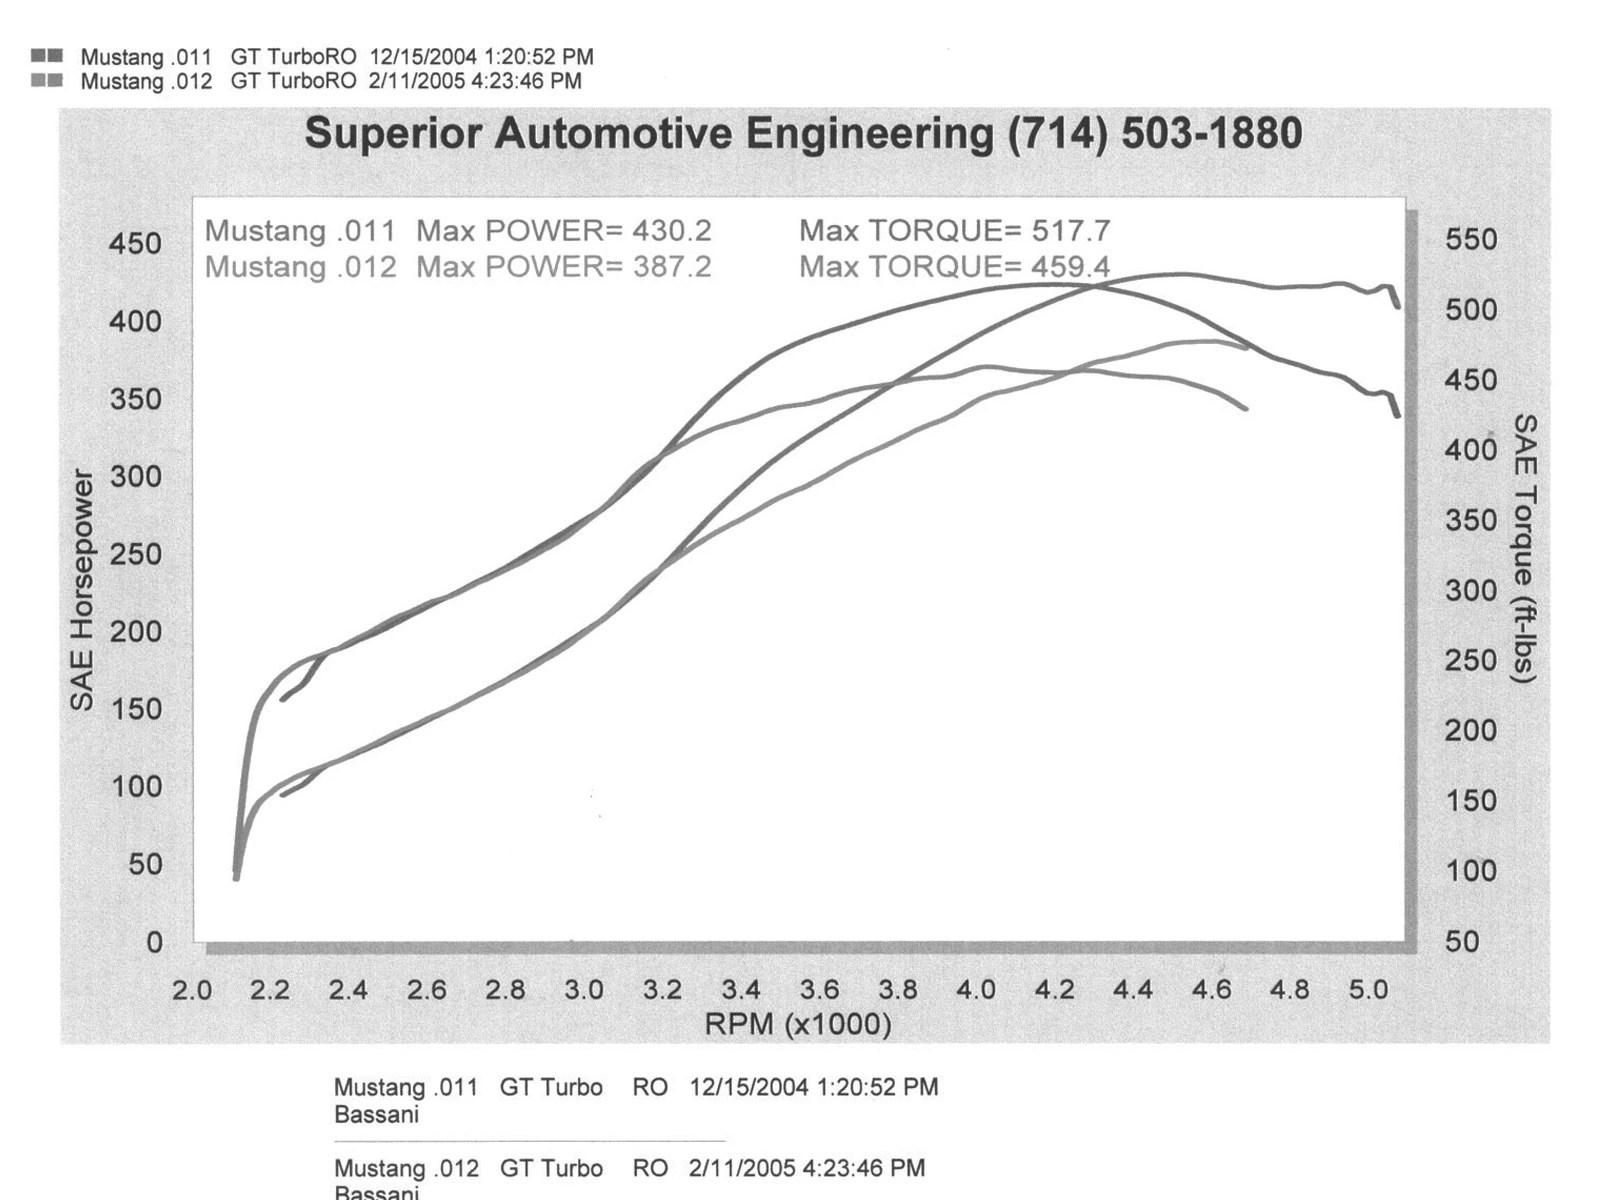 medium resolution of m5lp 0507 14 hps turbo kit chassis dyno graph